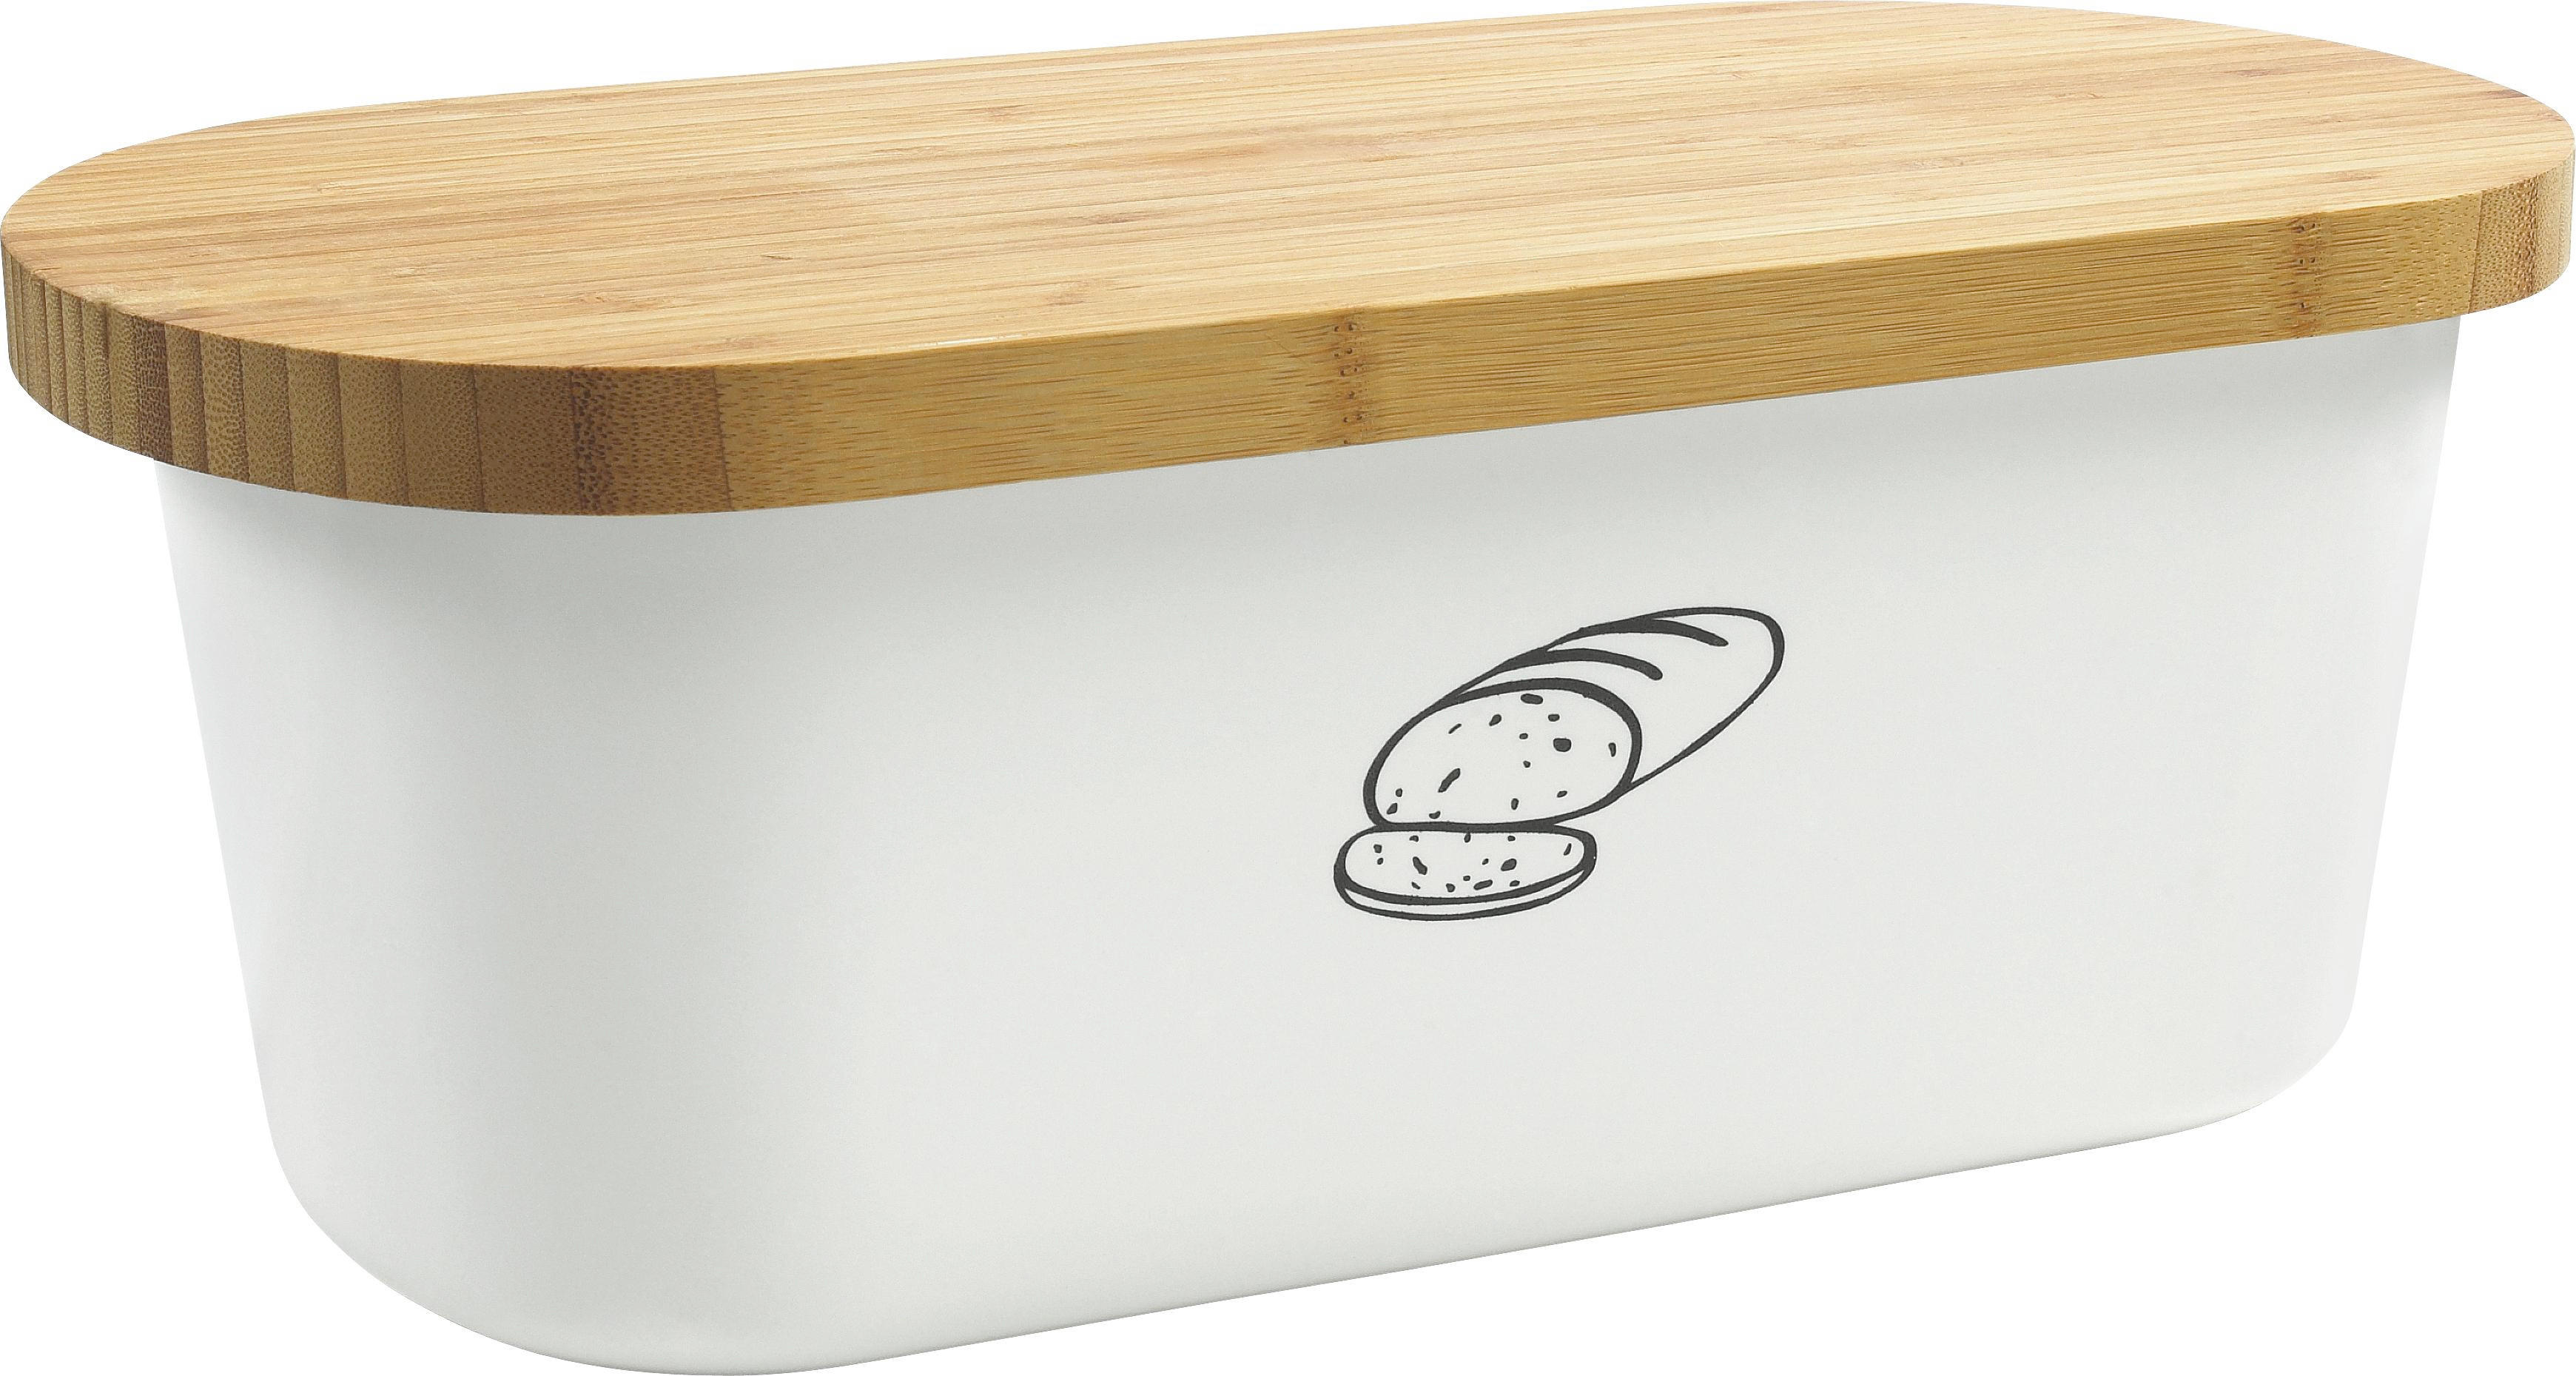 BROTBOX - Braun/Weiß, Basics, Holz/Kunststoff (34/18/13cm)